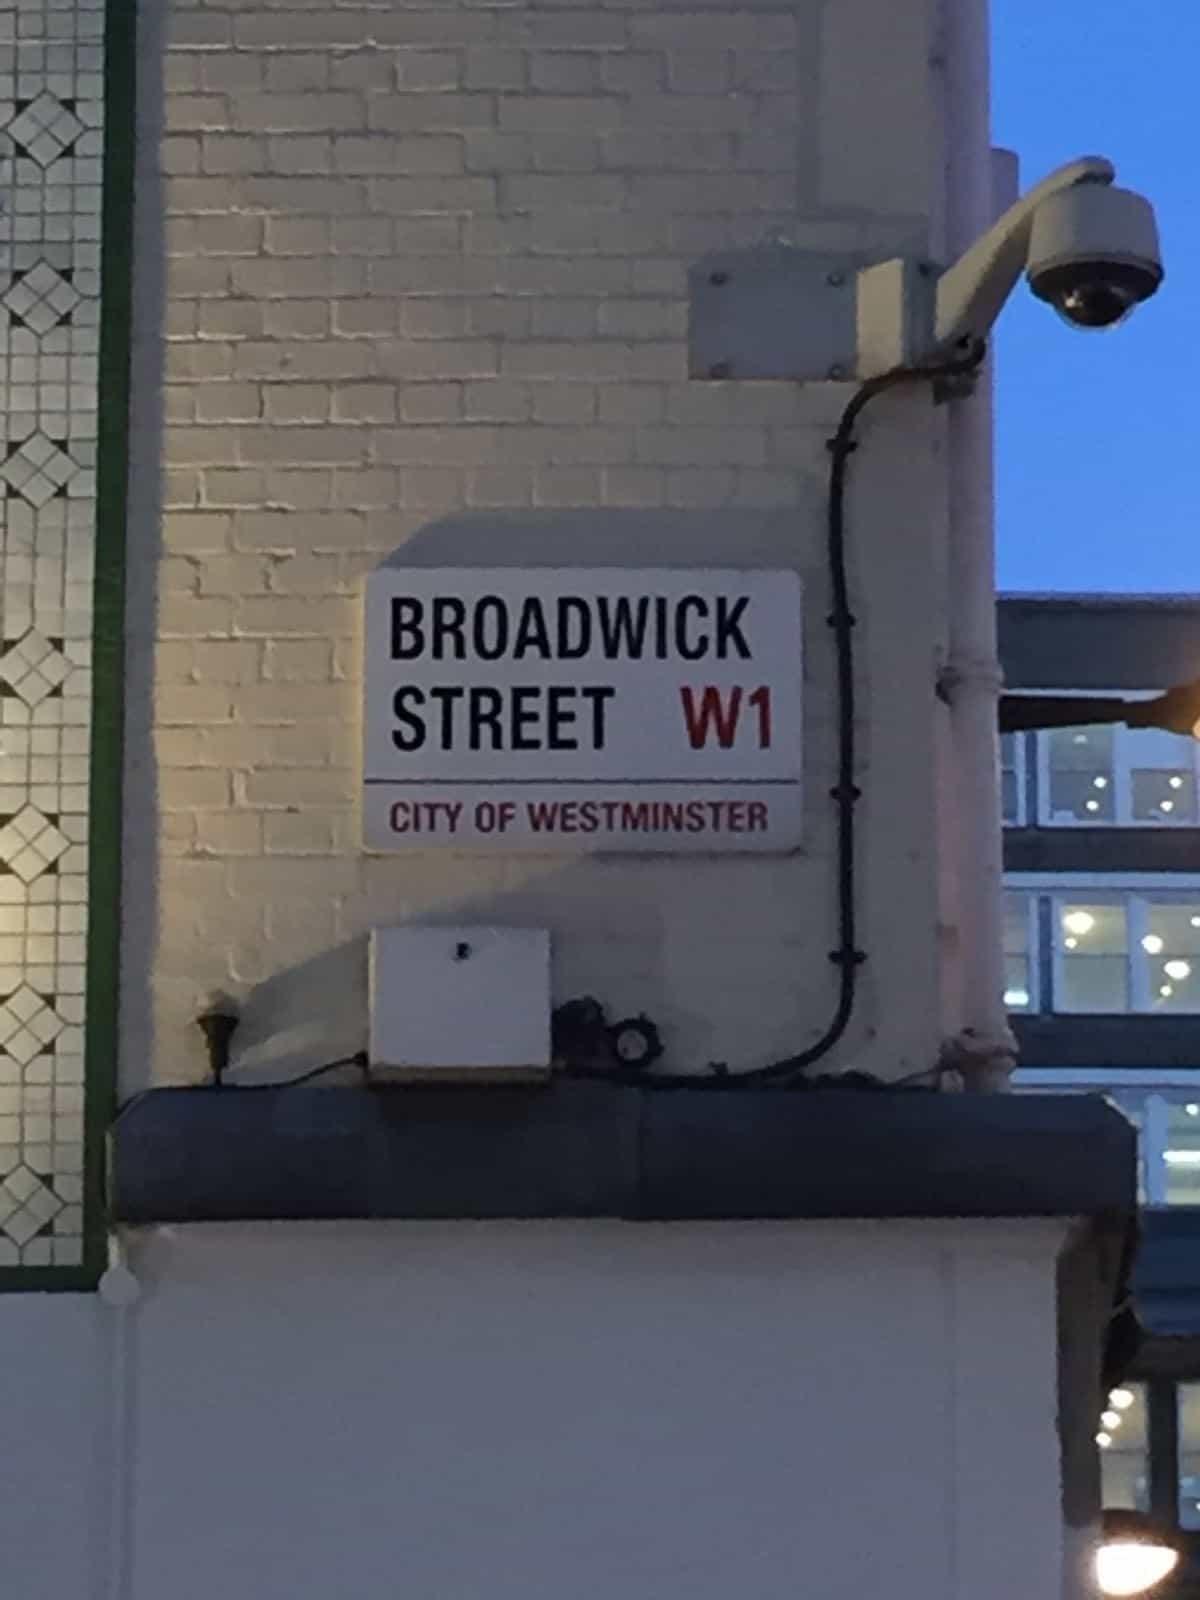 Broadwick Street hoje. Foto de Glauber Giustina